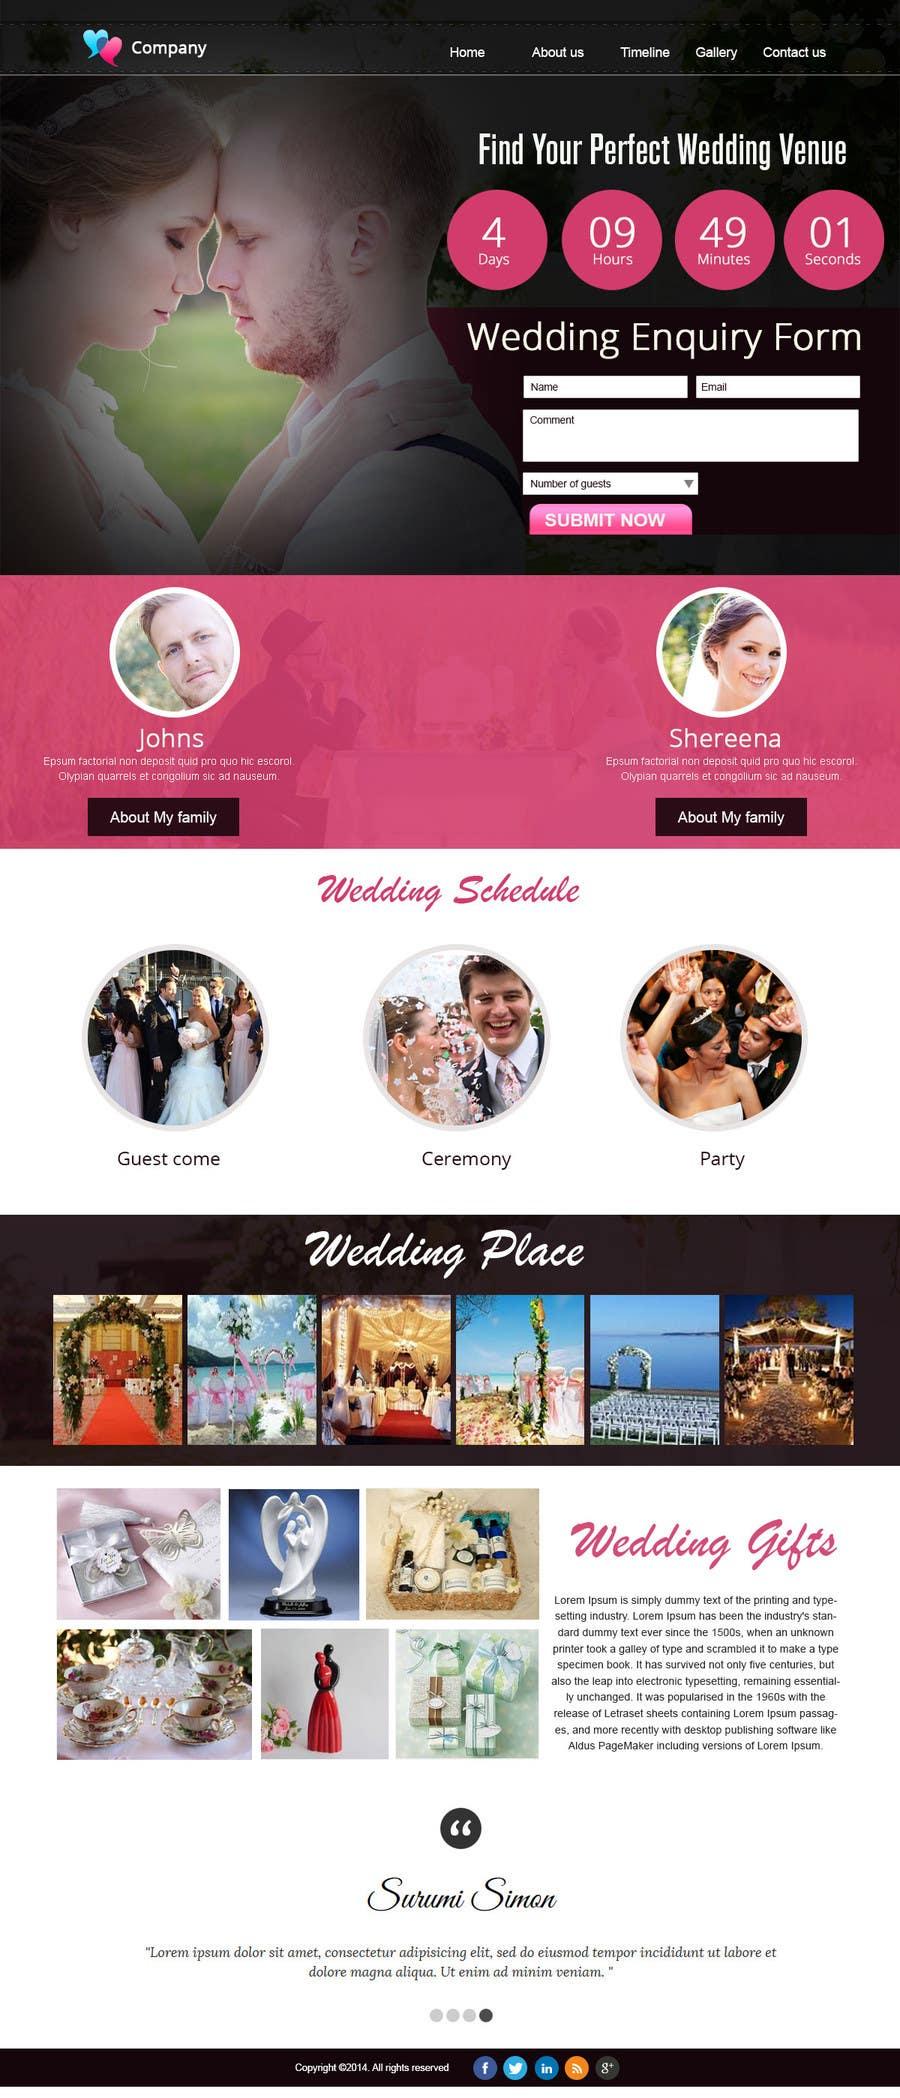 Penyertaan Peraduan #                                        7                                      untuk                                         Wedding design - one page template